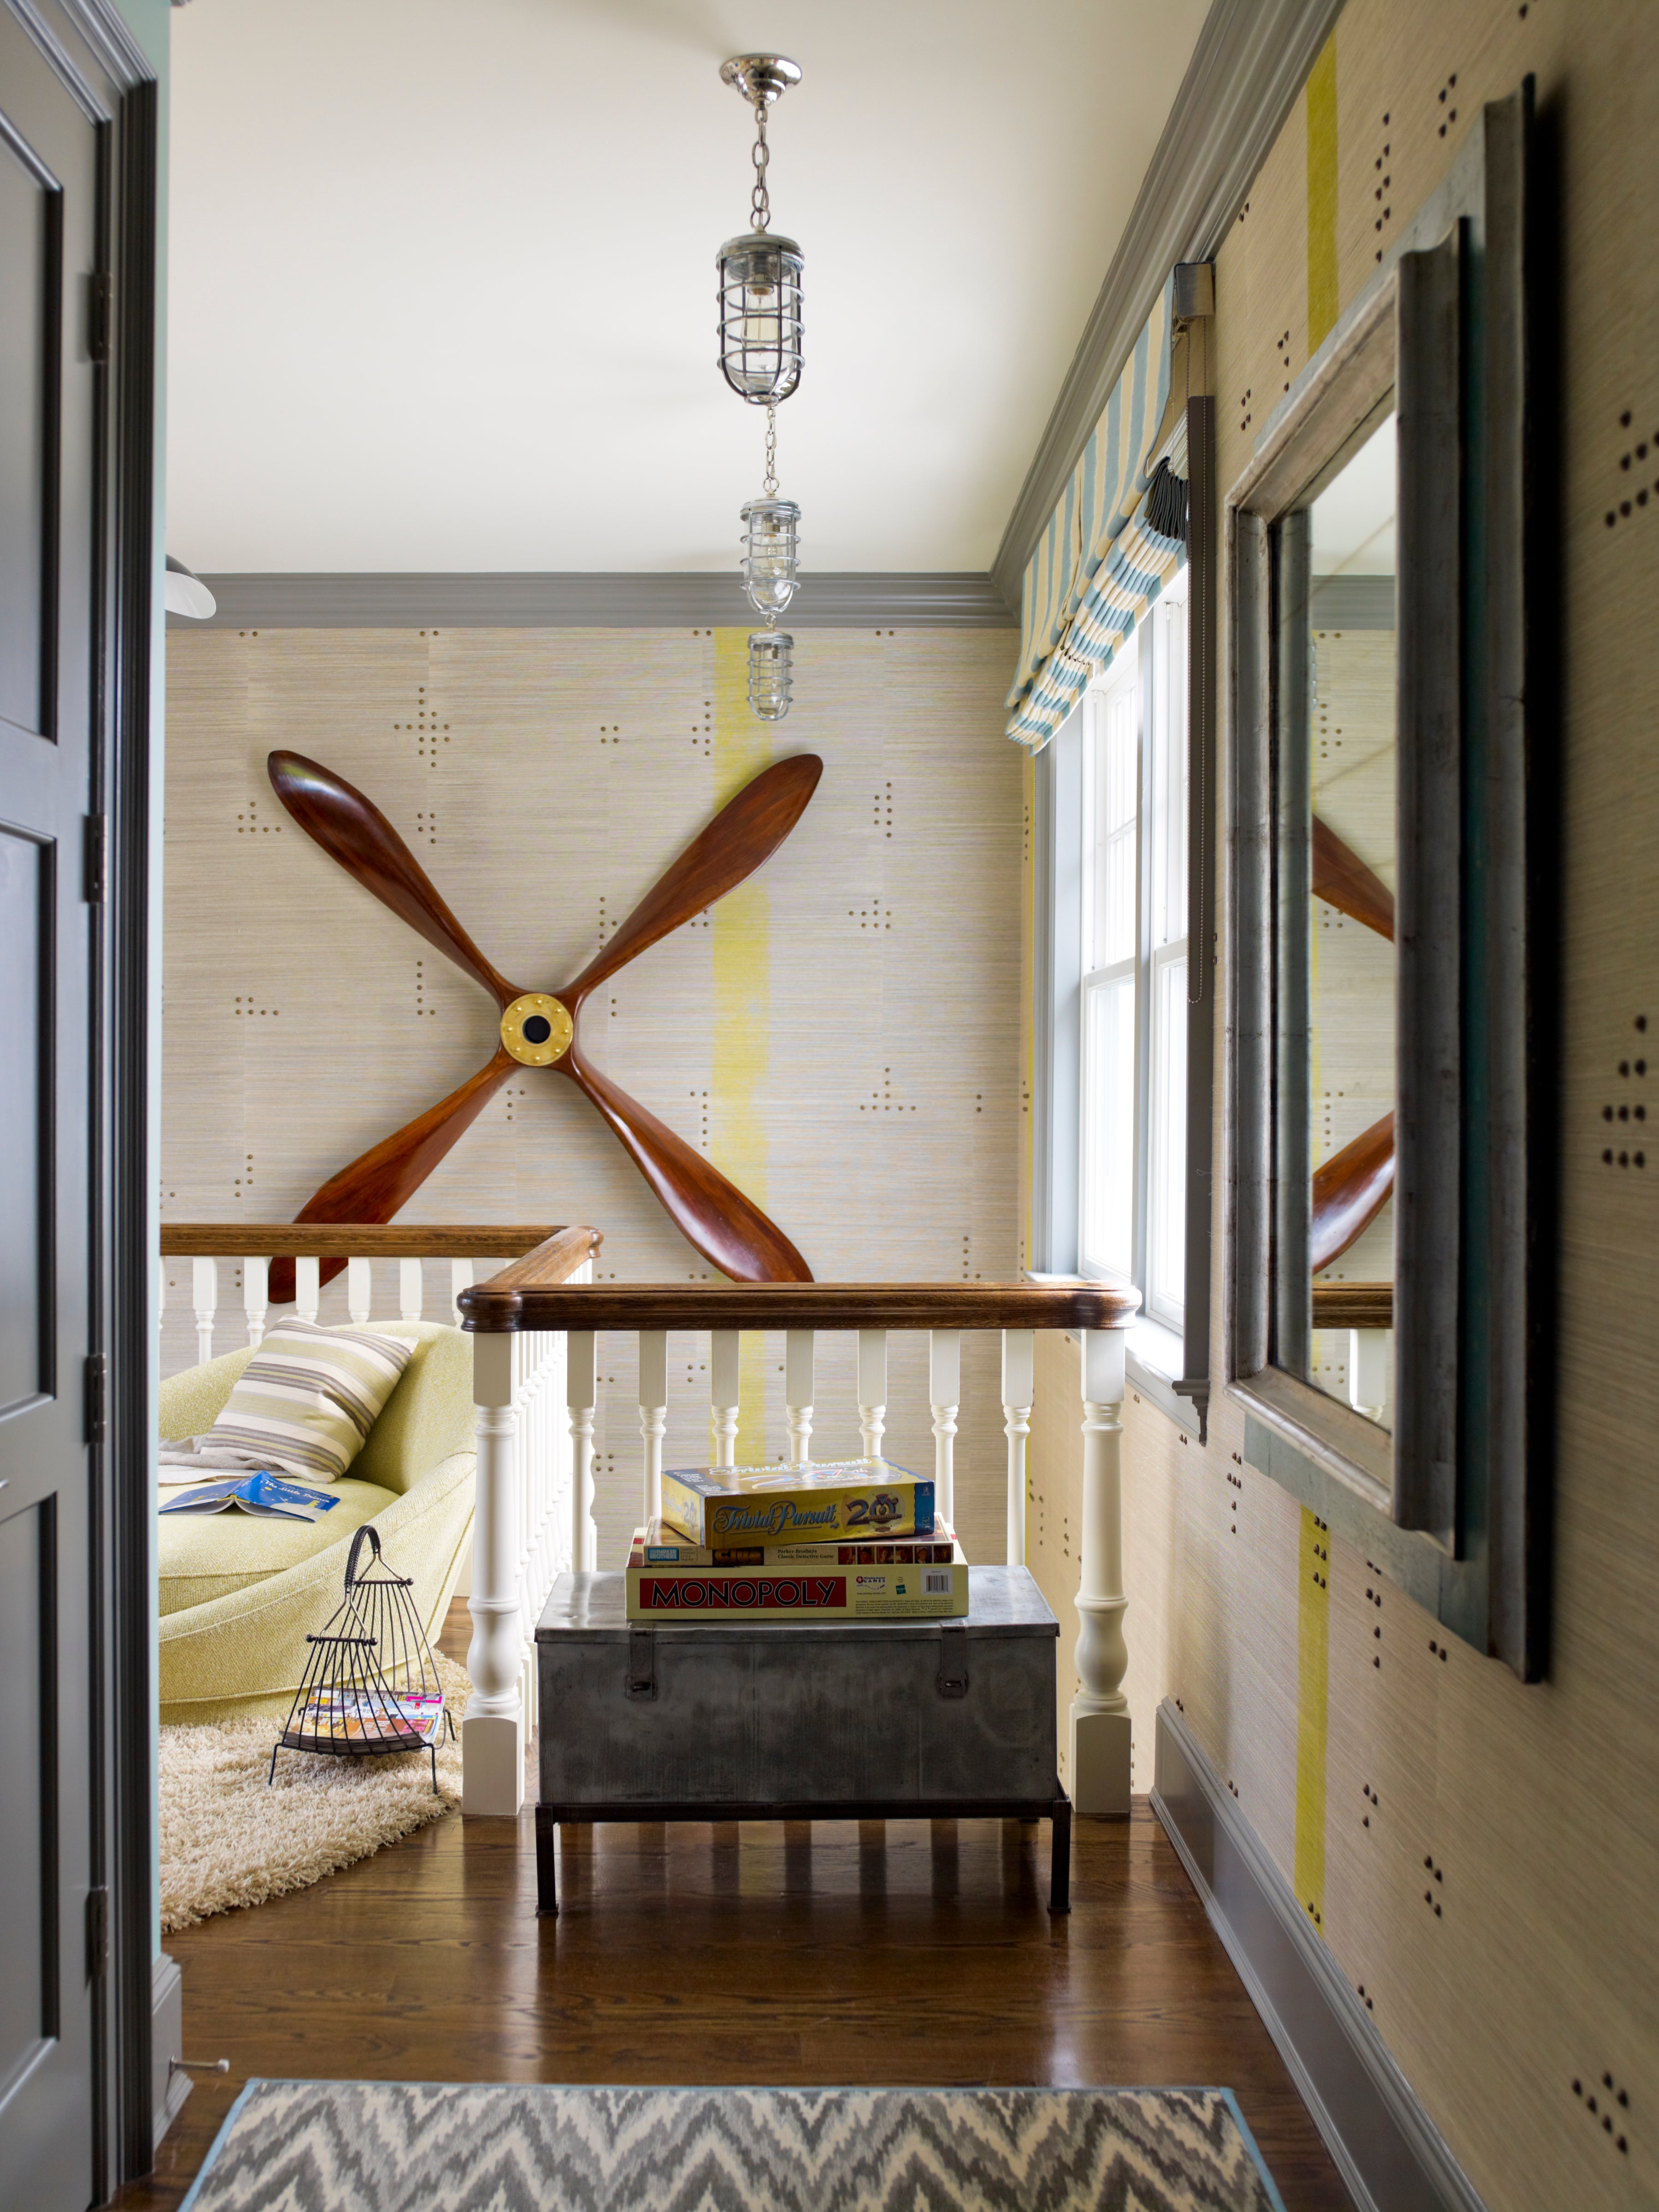 Hampton Designer Showhouse 2011 By Mendelson Group